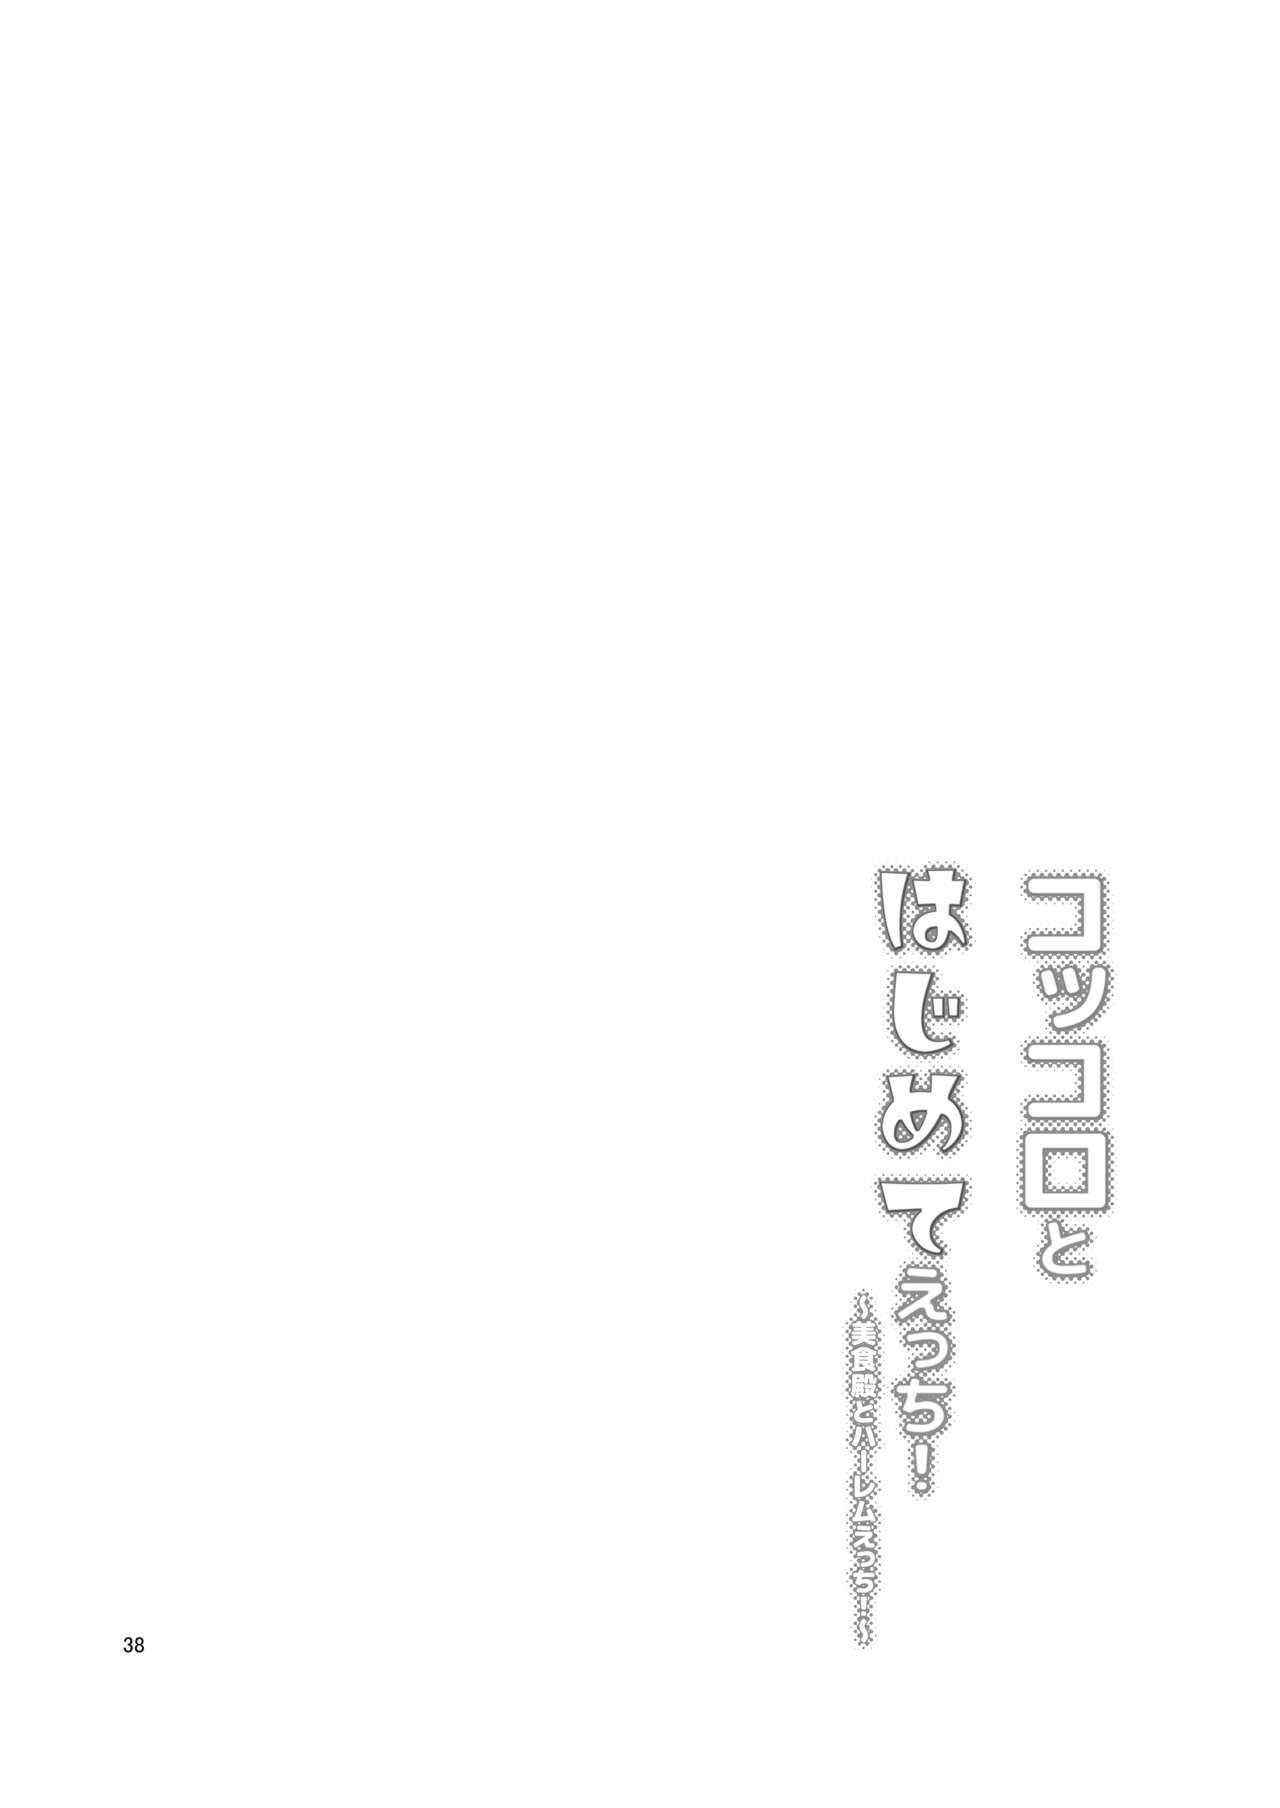 Kokkoro to Hajimete Ecchi! 36